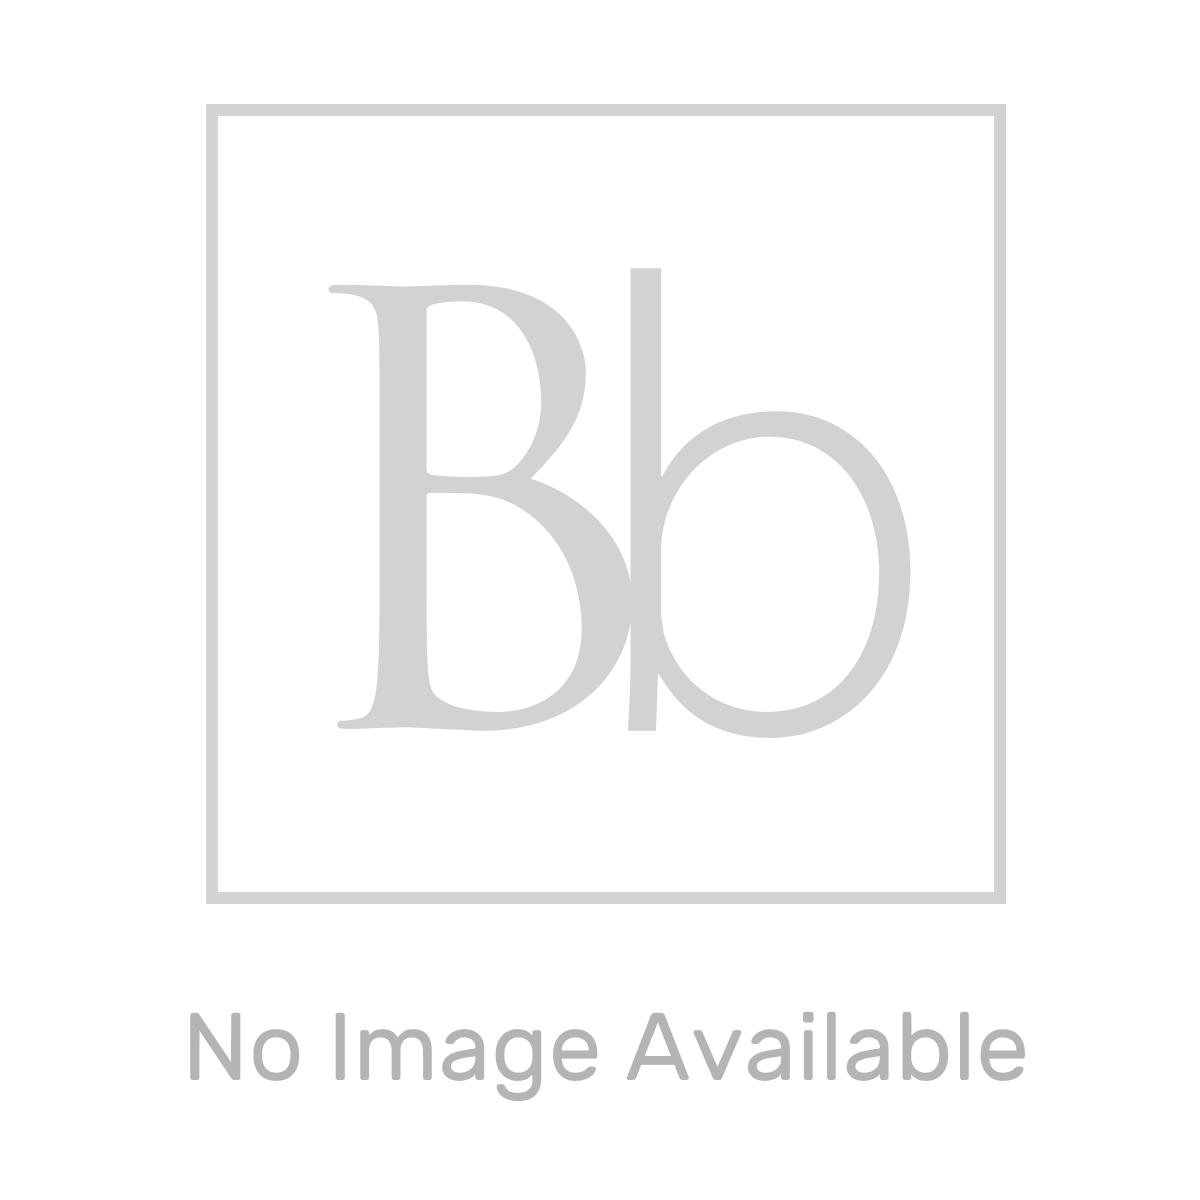 Sensio Round Class Shower Light Fitting